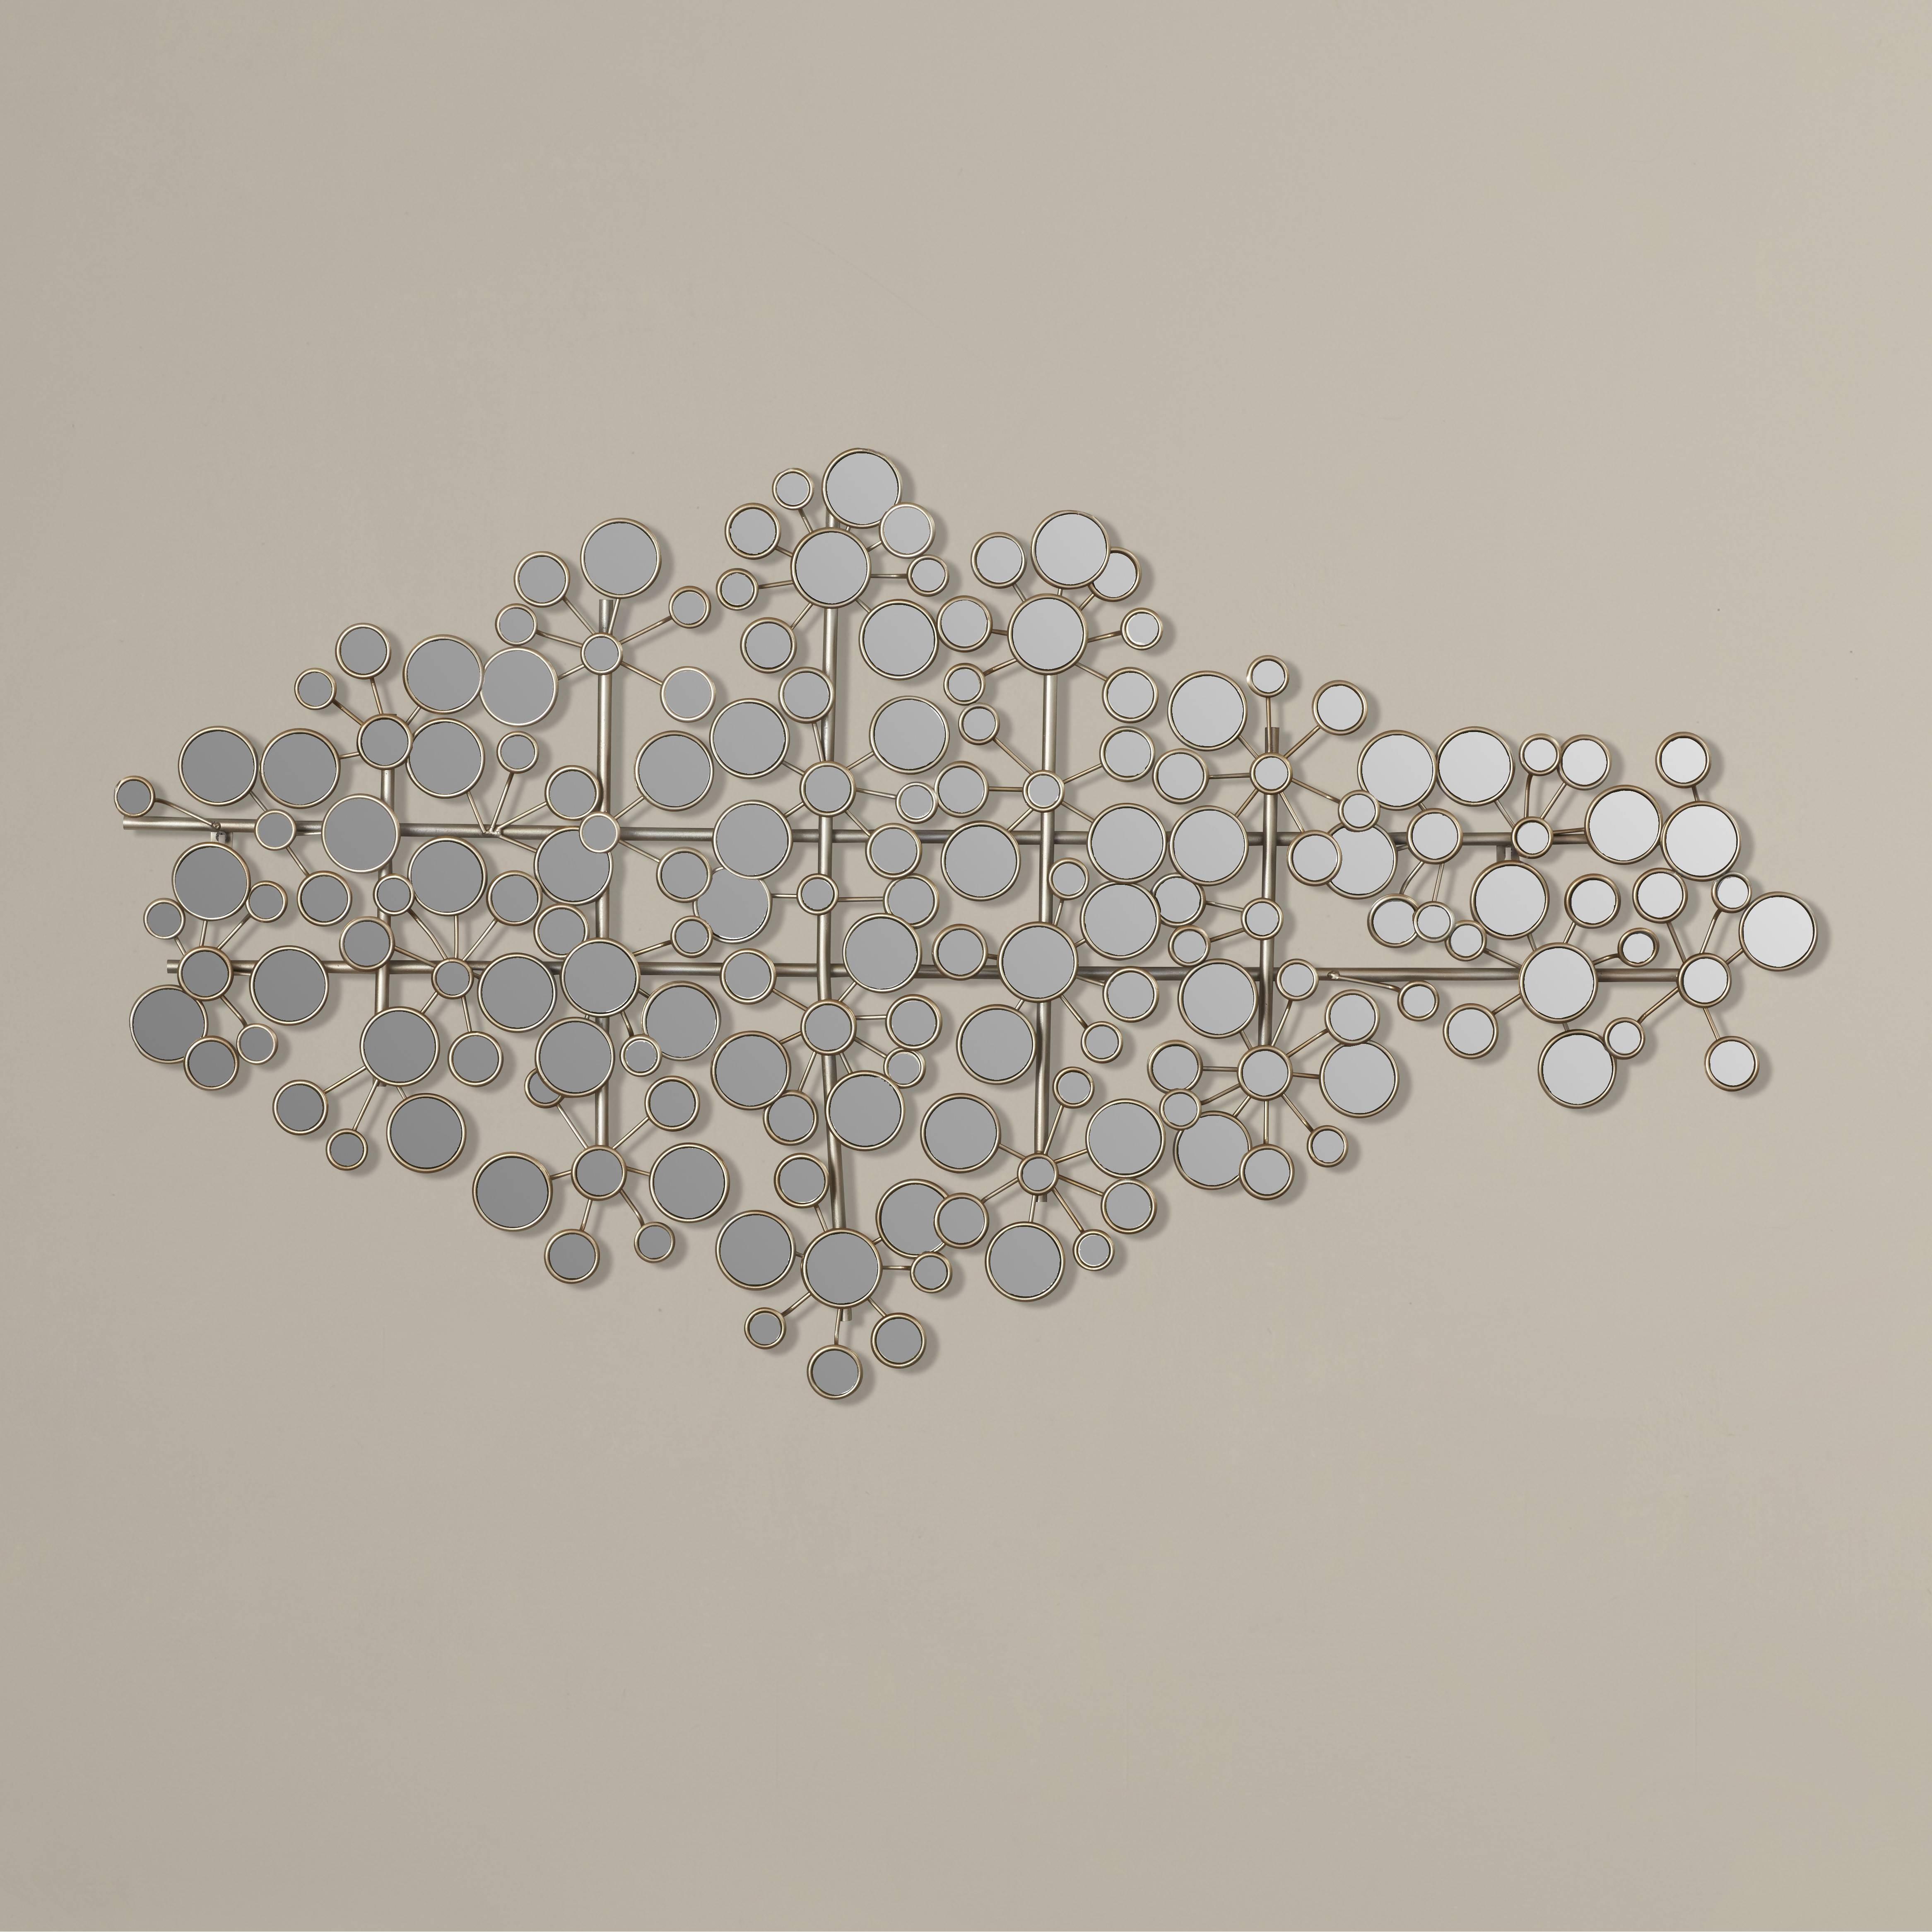 Wall Art Design Ideas: Wayfair Brushed Nickel Wall Art Sample Regarding 2018 Brushed Metal Wall Art (View 16 of 20)